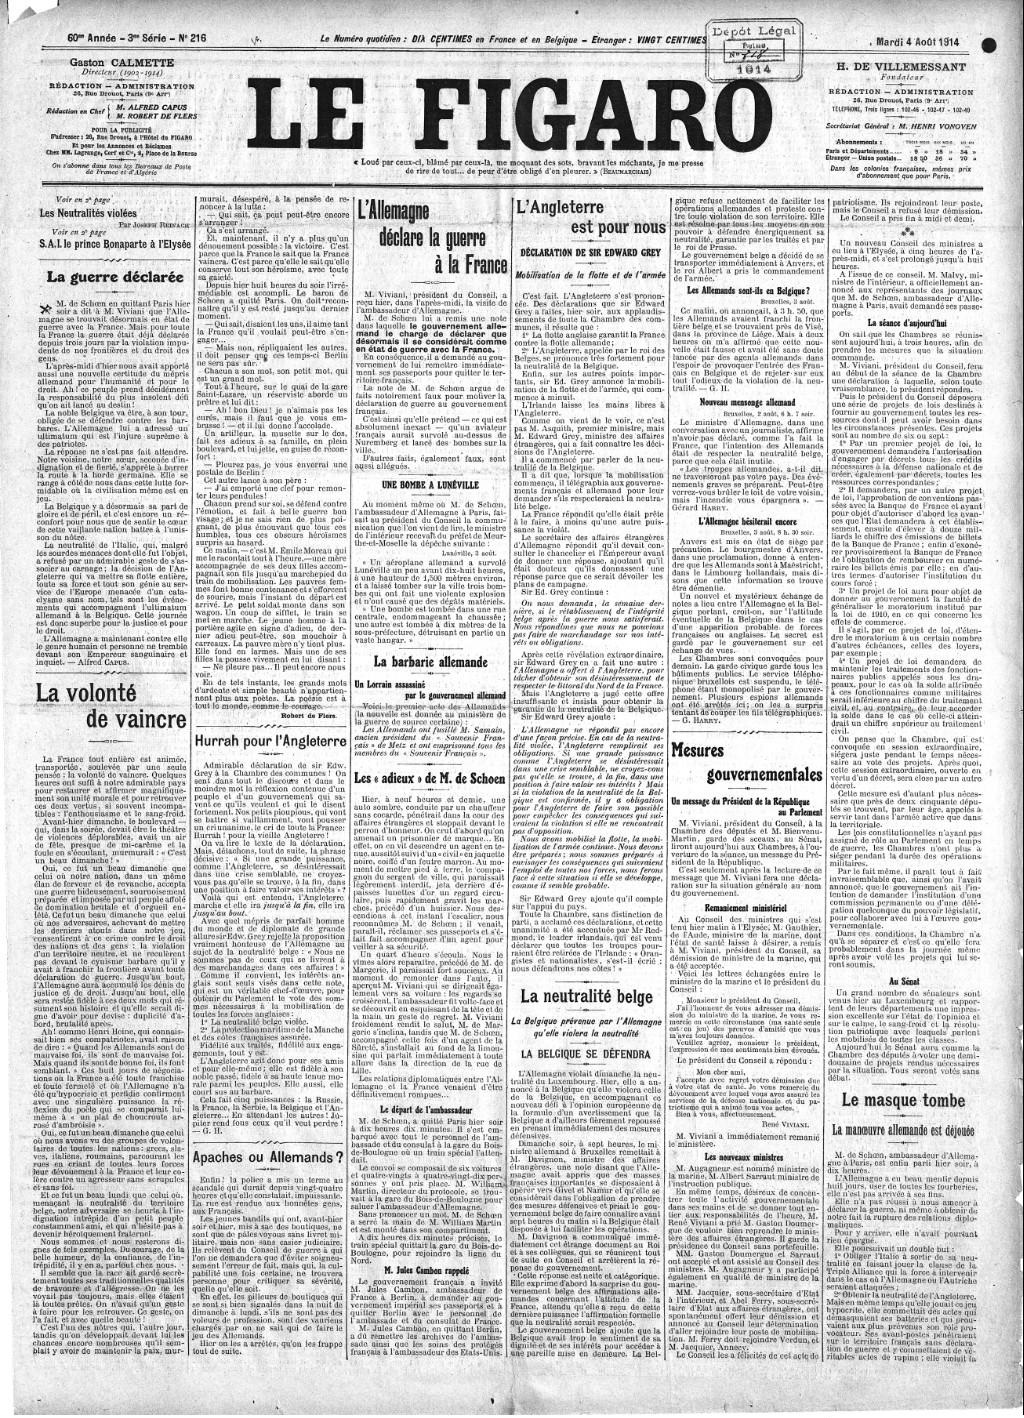 Le Figaro Wikipedia